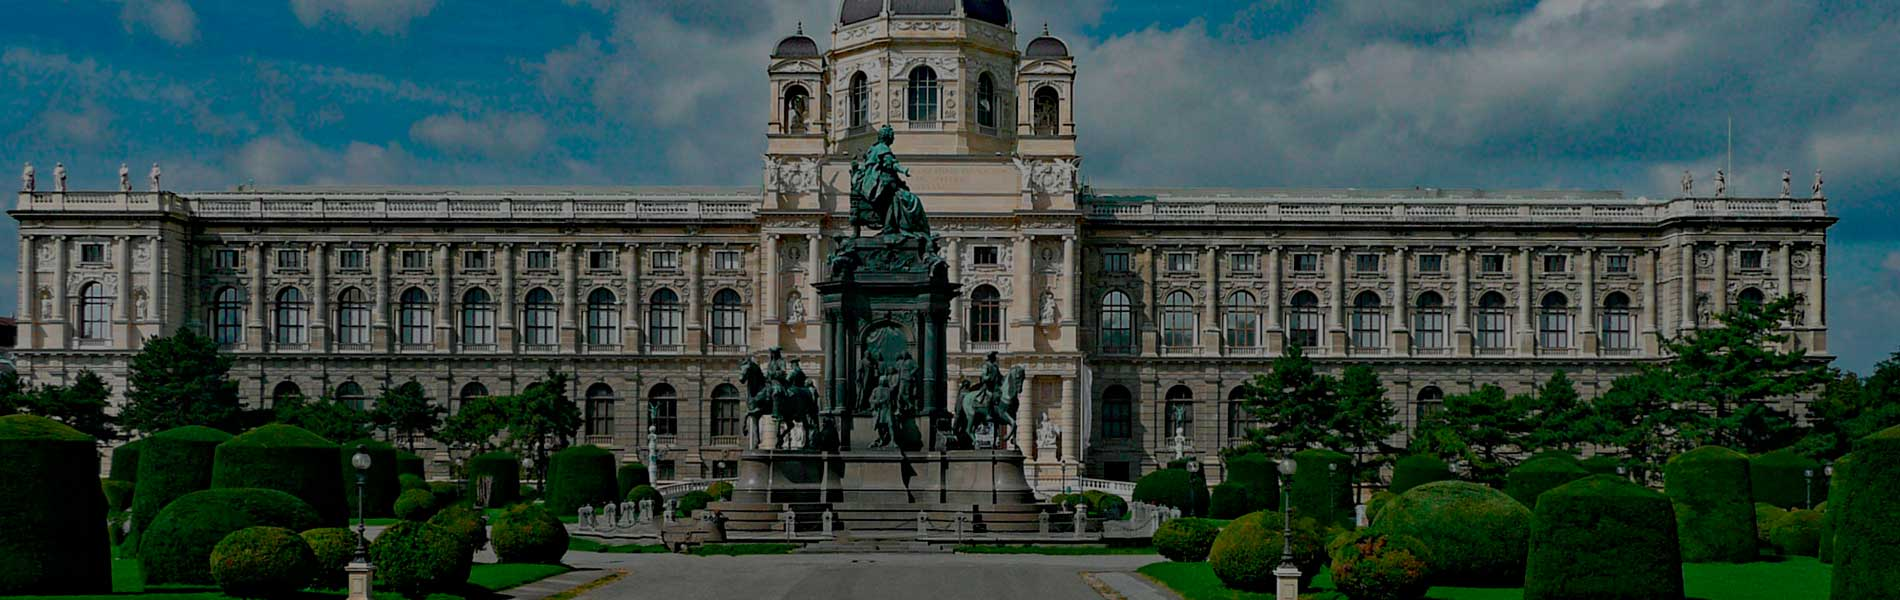 Curso de alemán en Austria